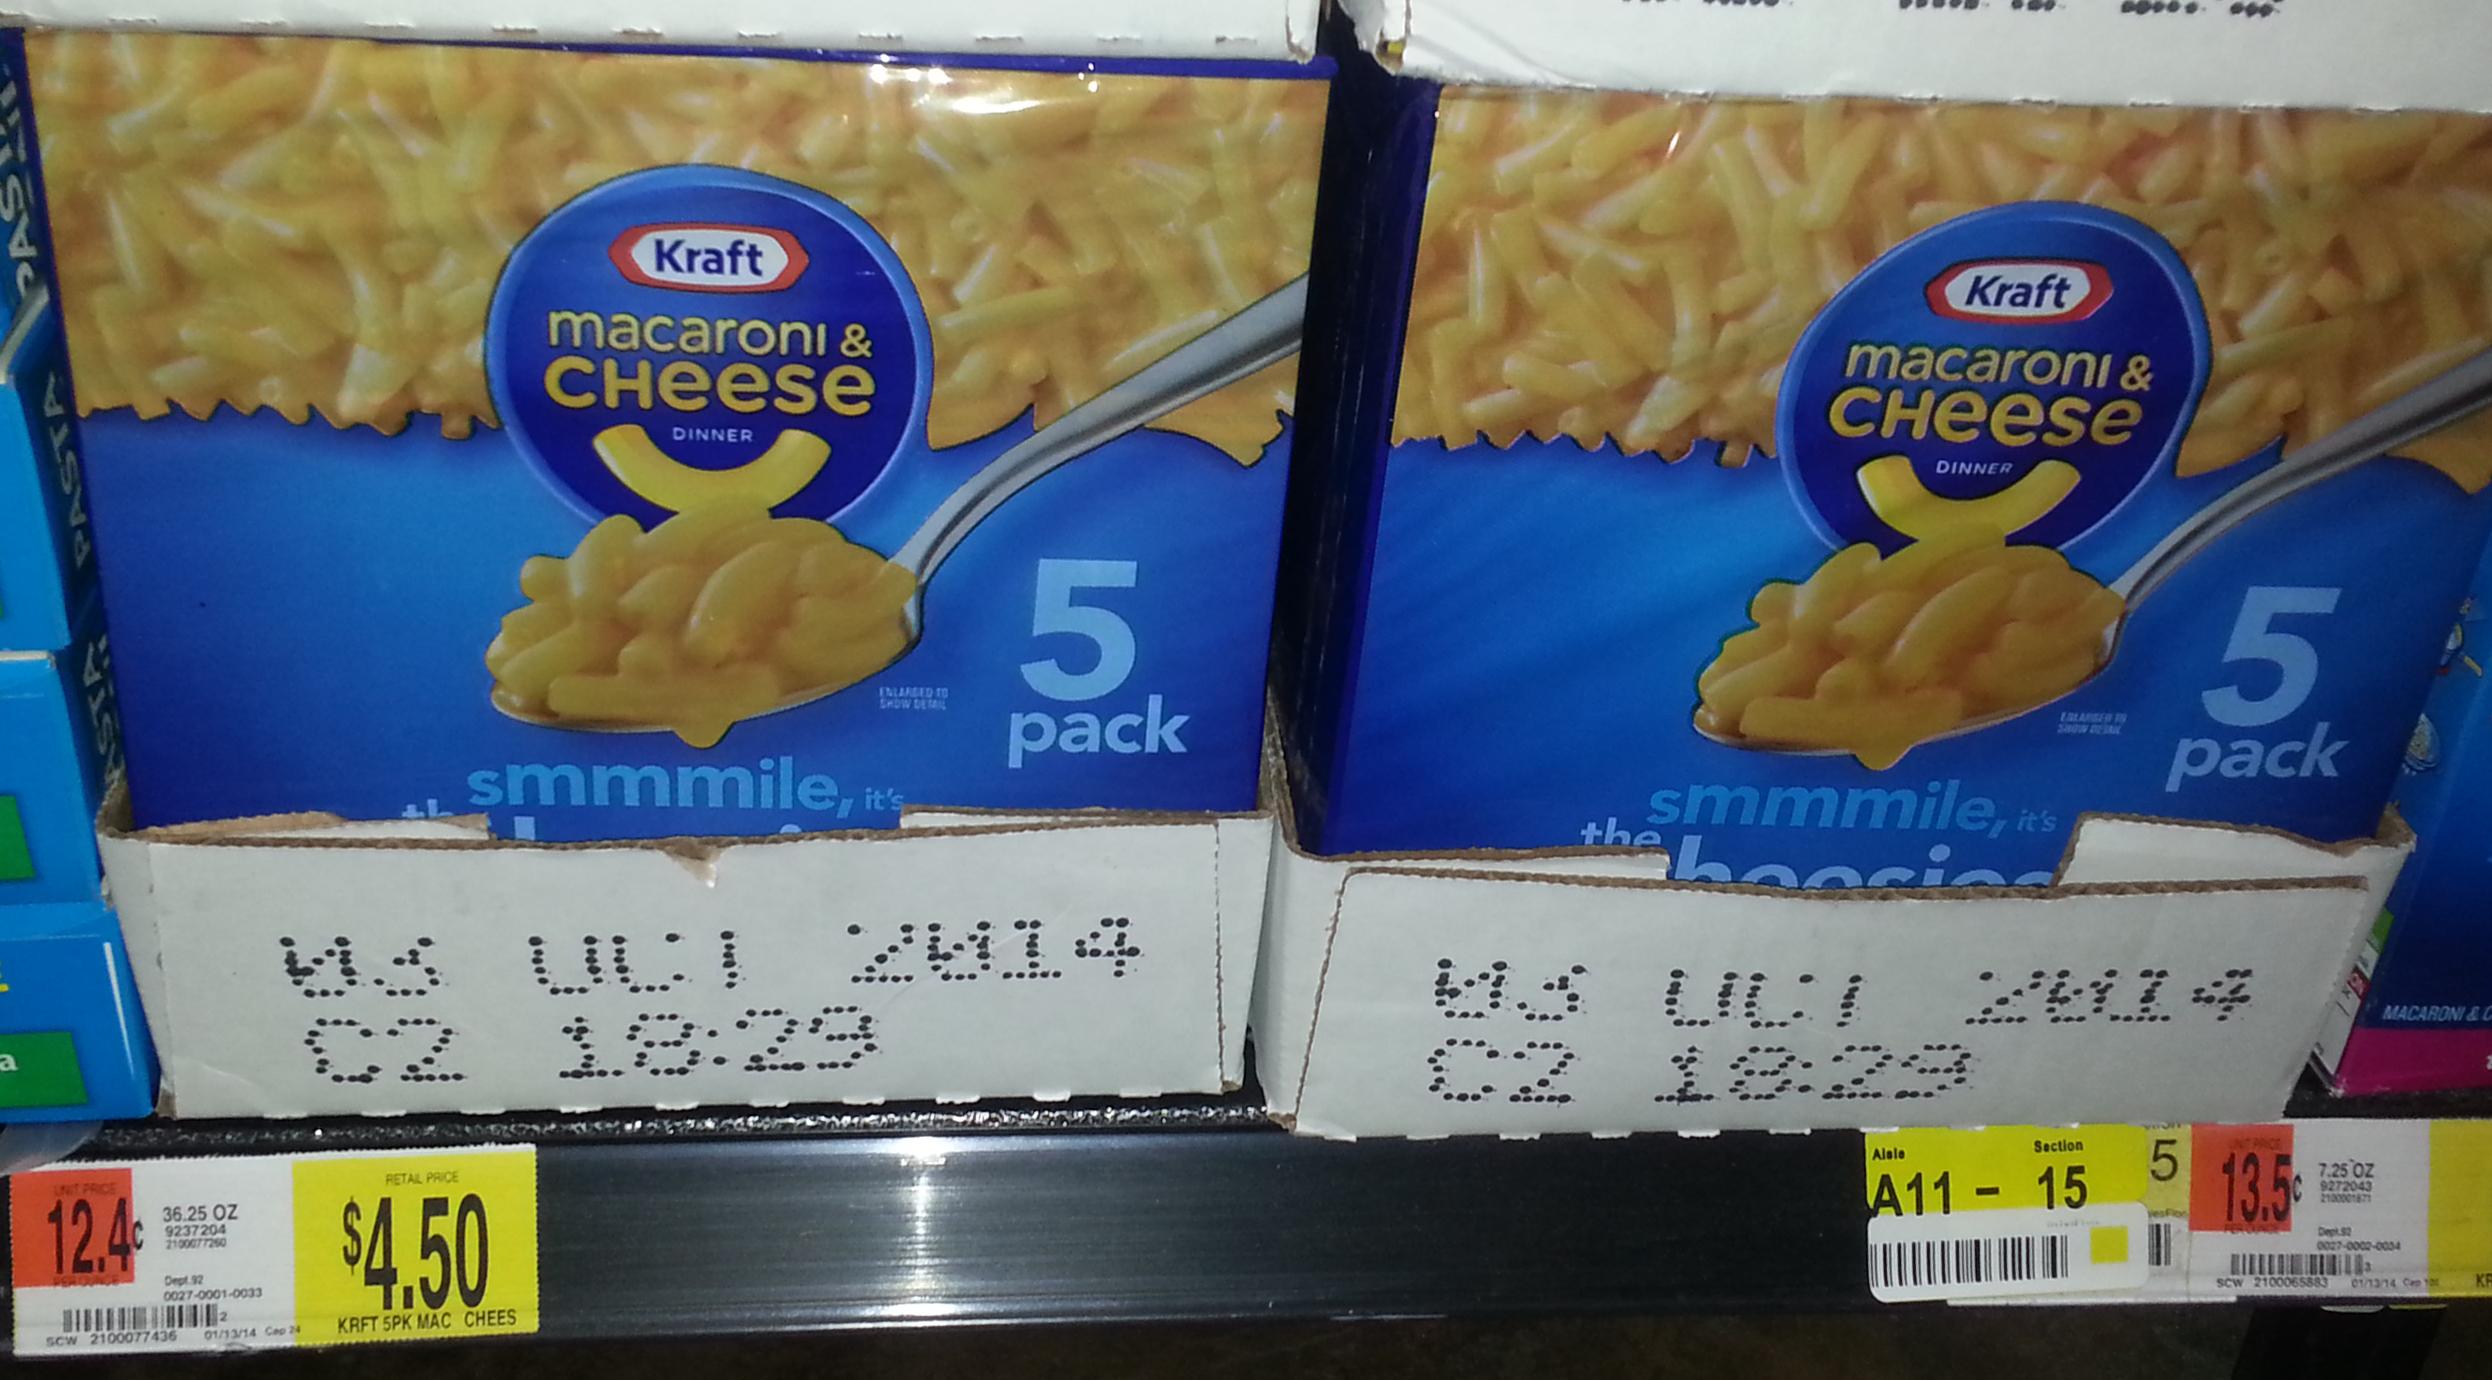 Kraft Macaroni & Cheese Dinner 5 Pack Just $3.50at Walmart!